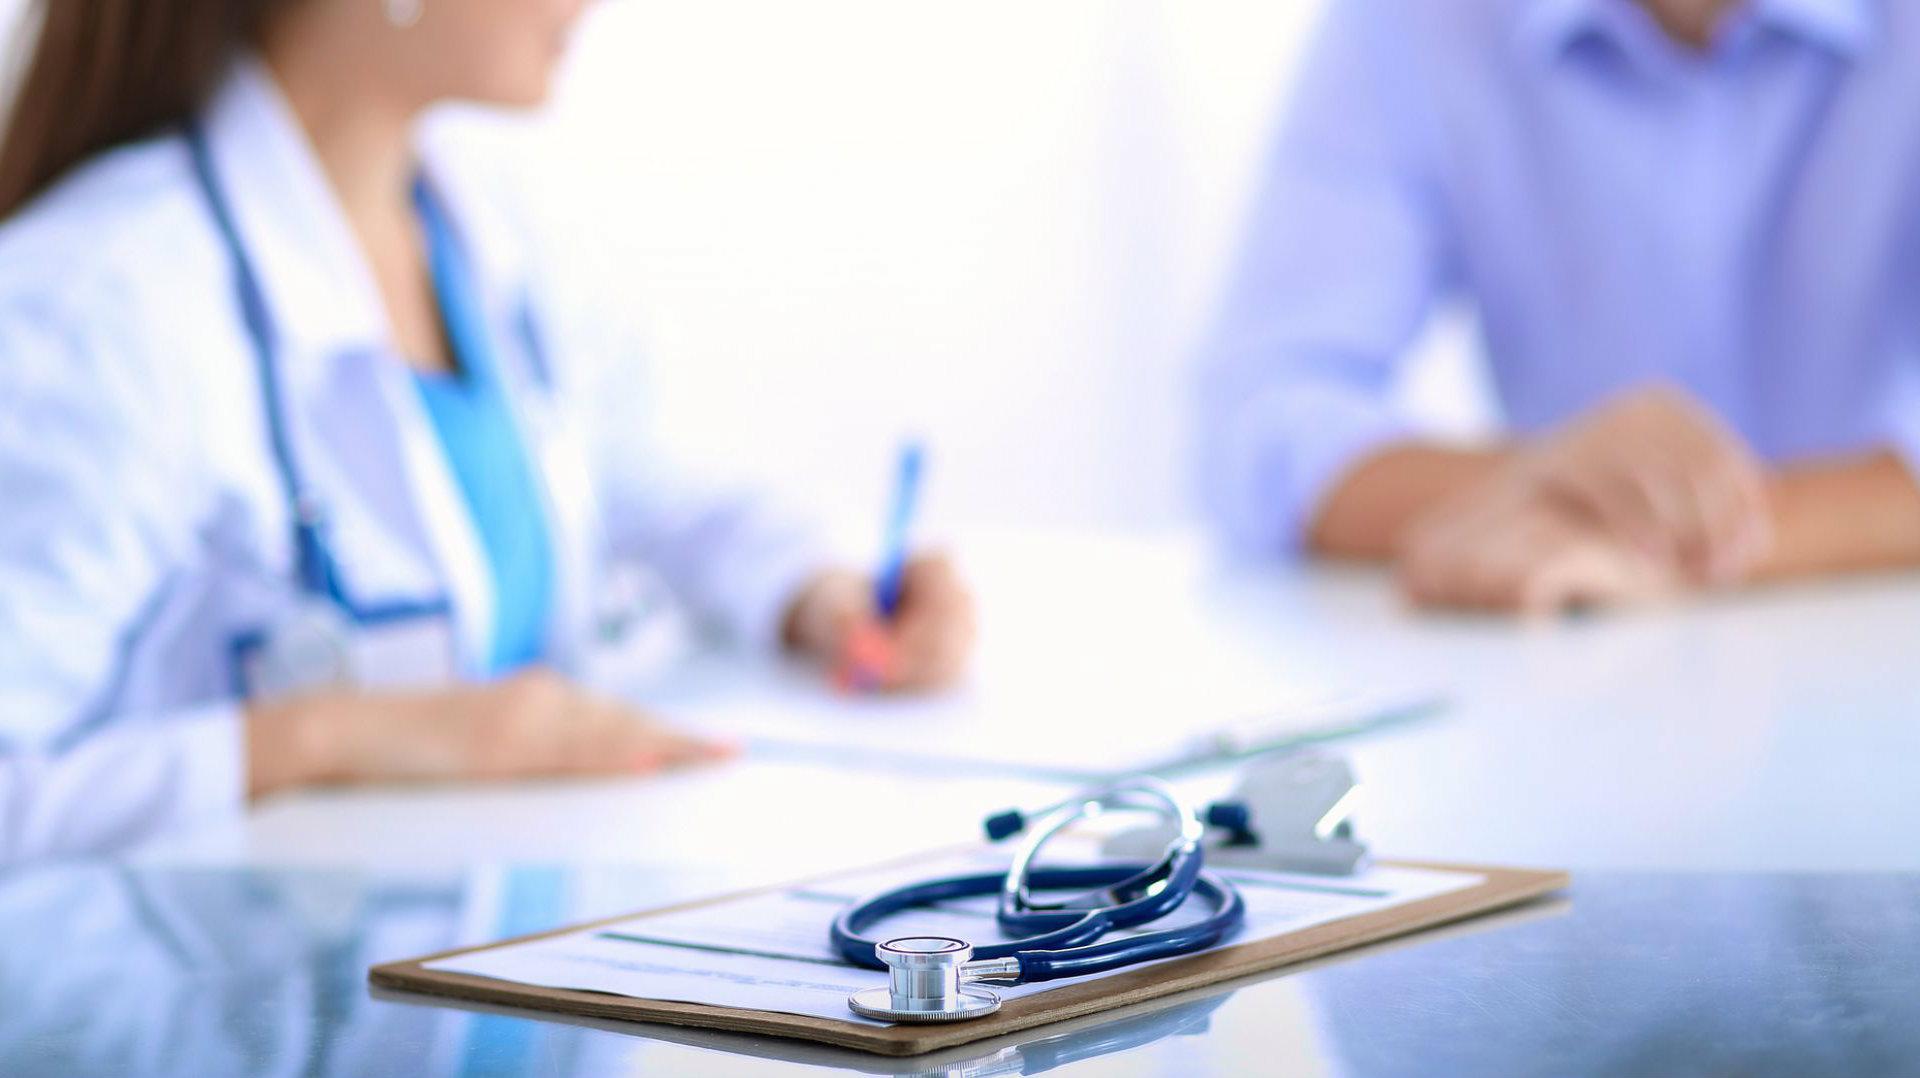 plano de saúde premium